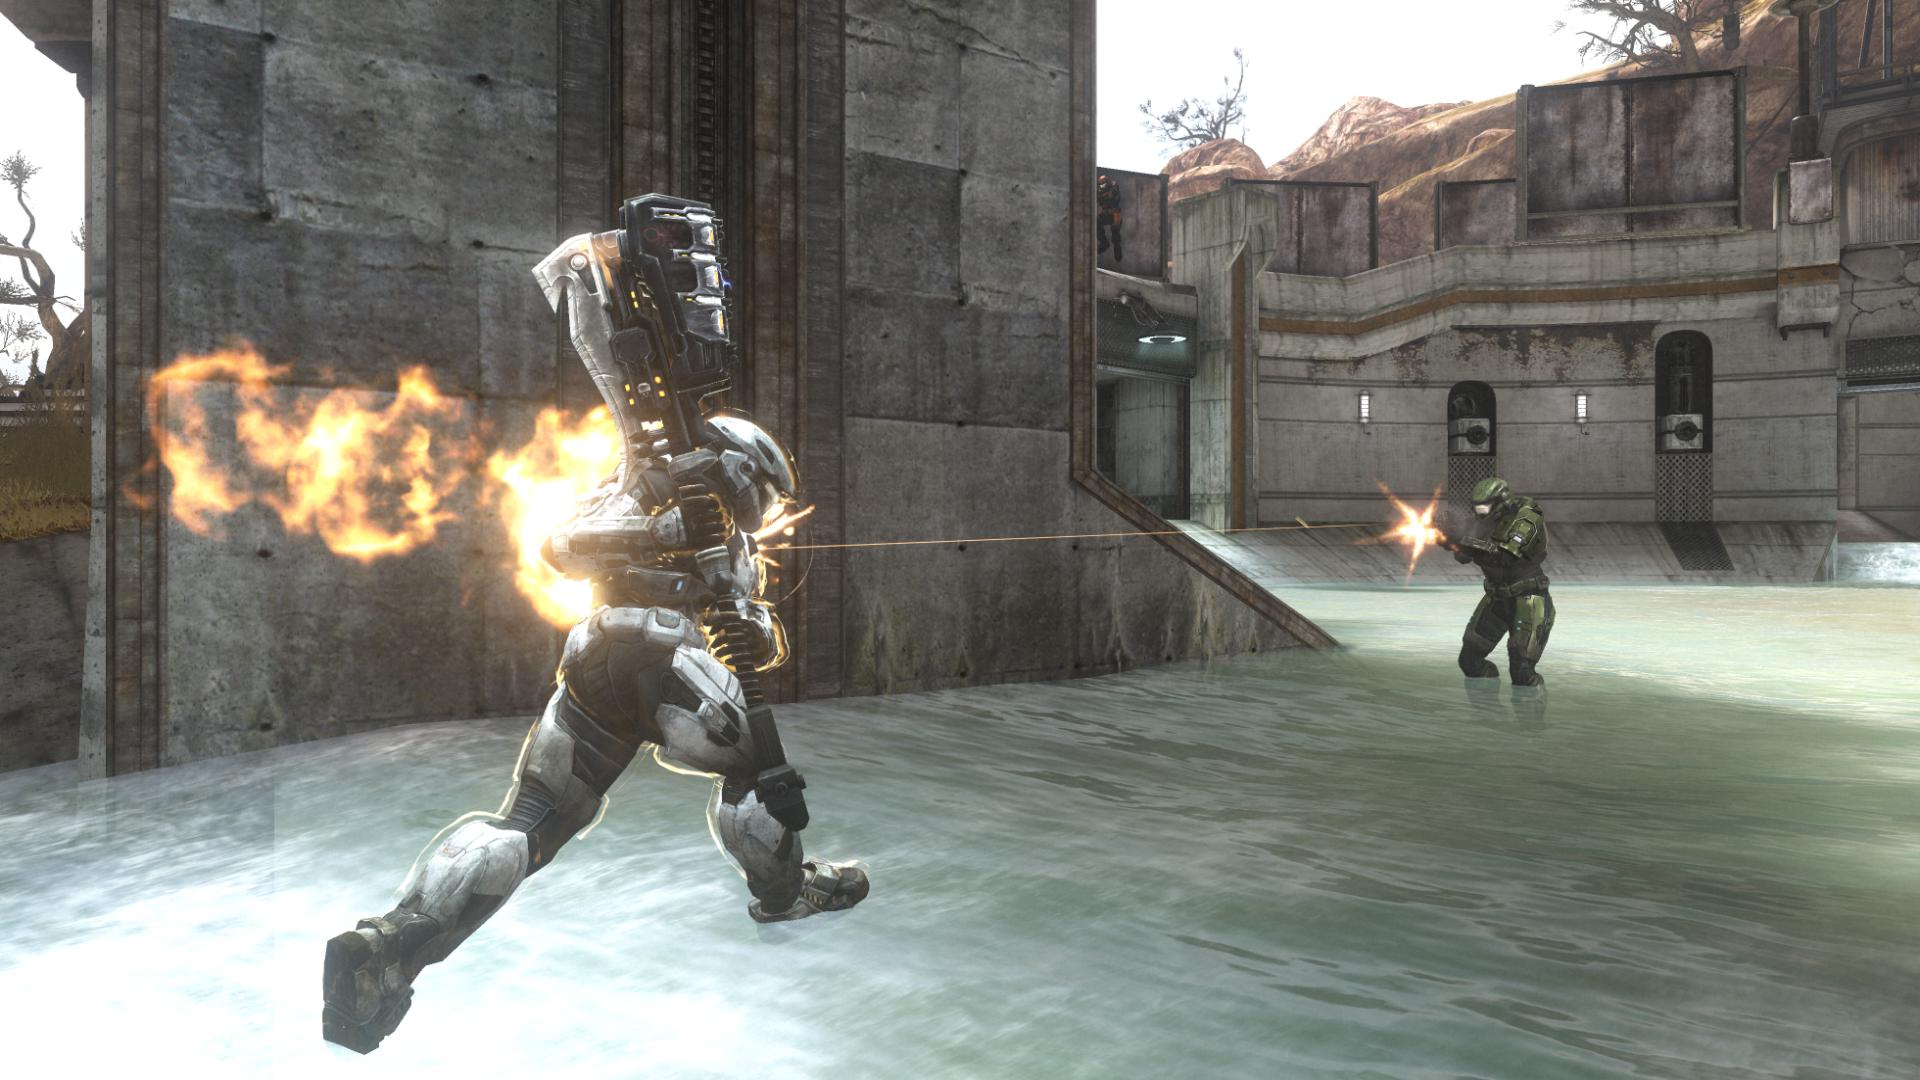 3 contra 1 (Juggernaut)